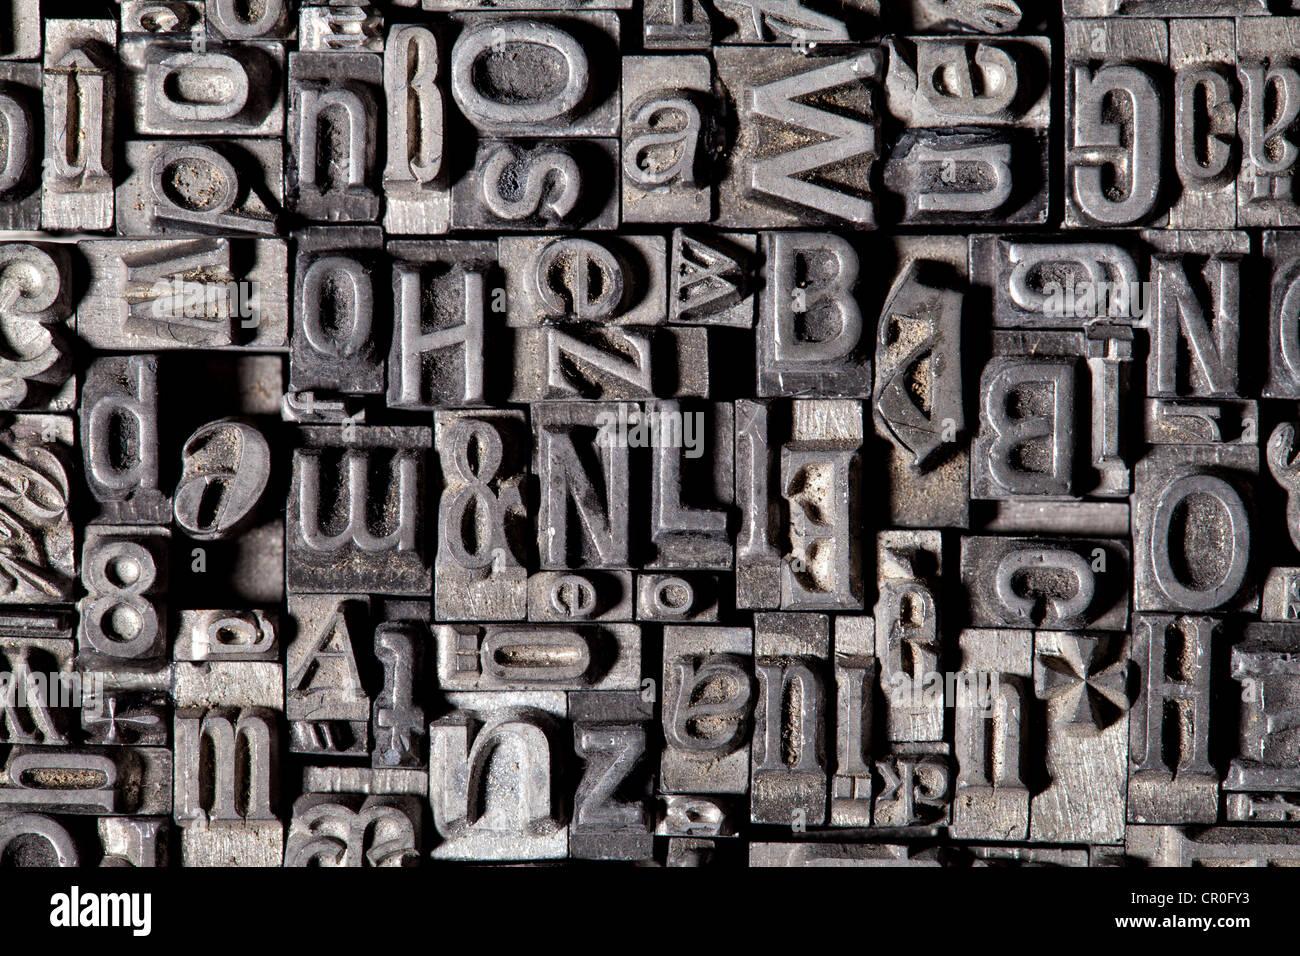 Letterpress Printing Stock Photos  Letterpress Printing Stock